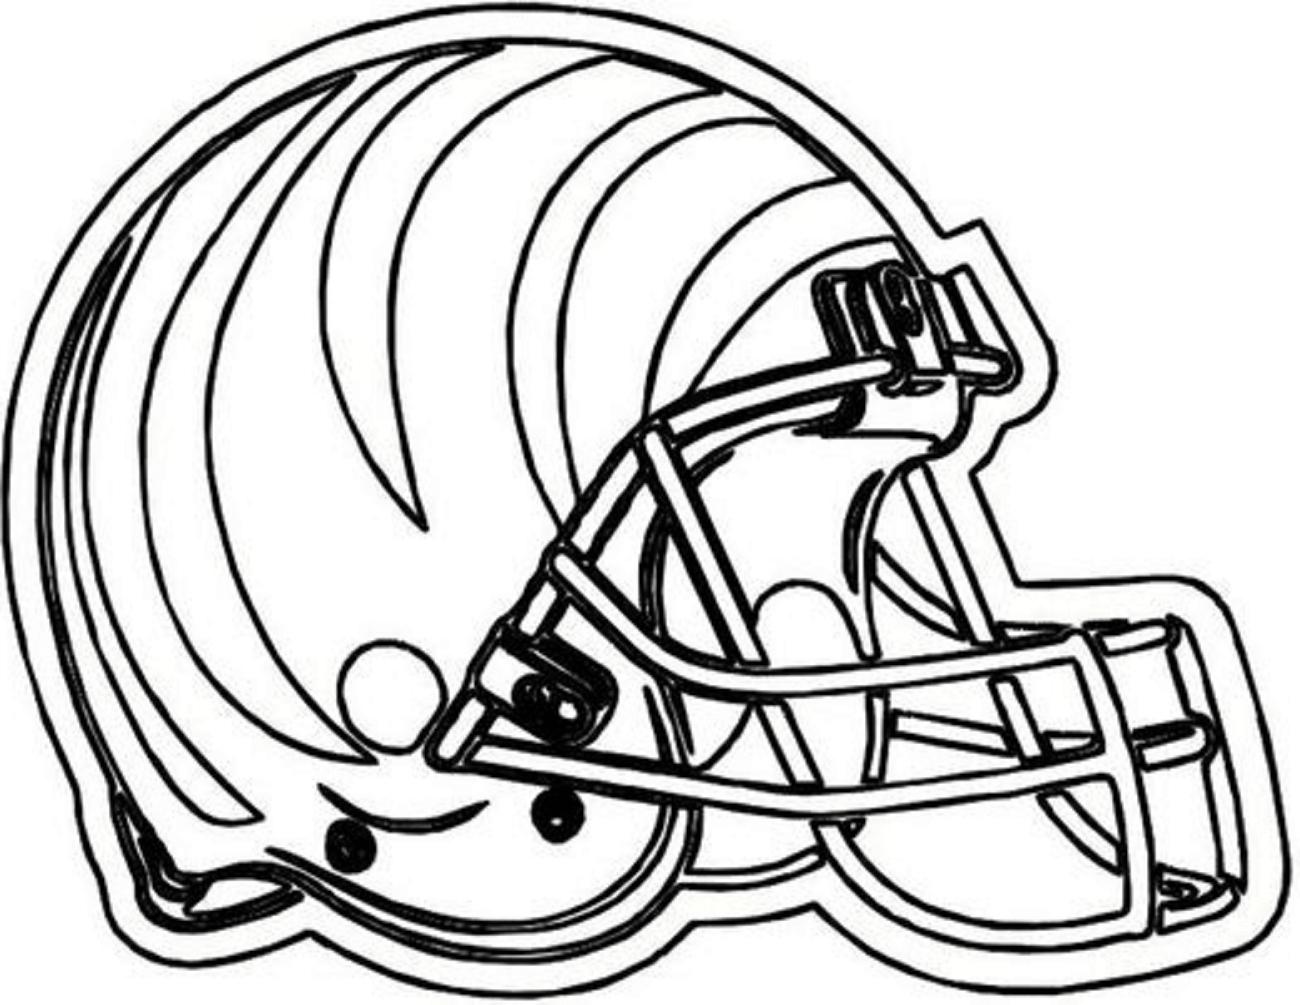 A Football Helmet